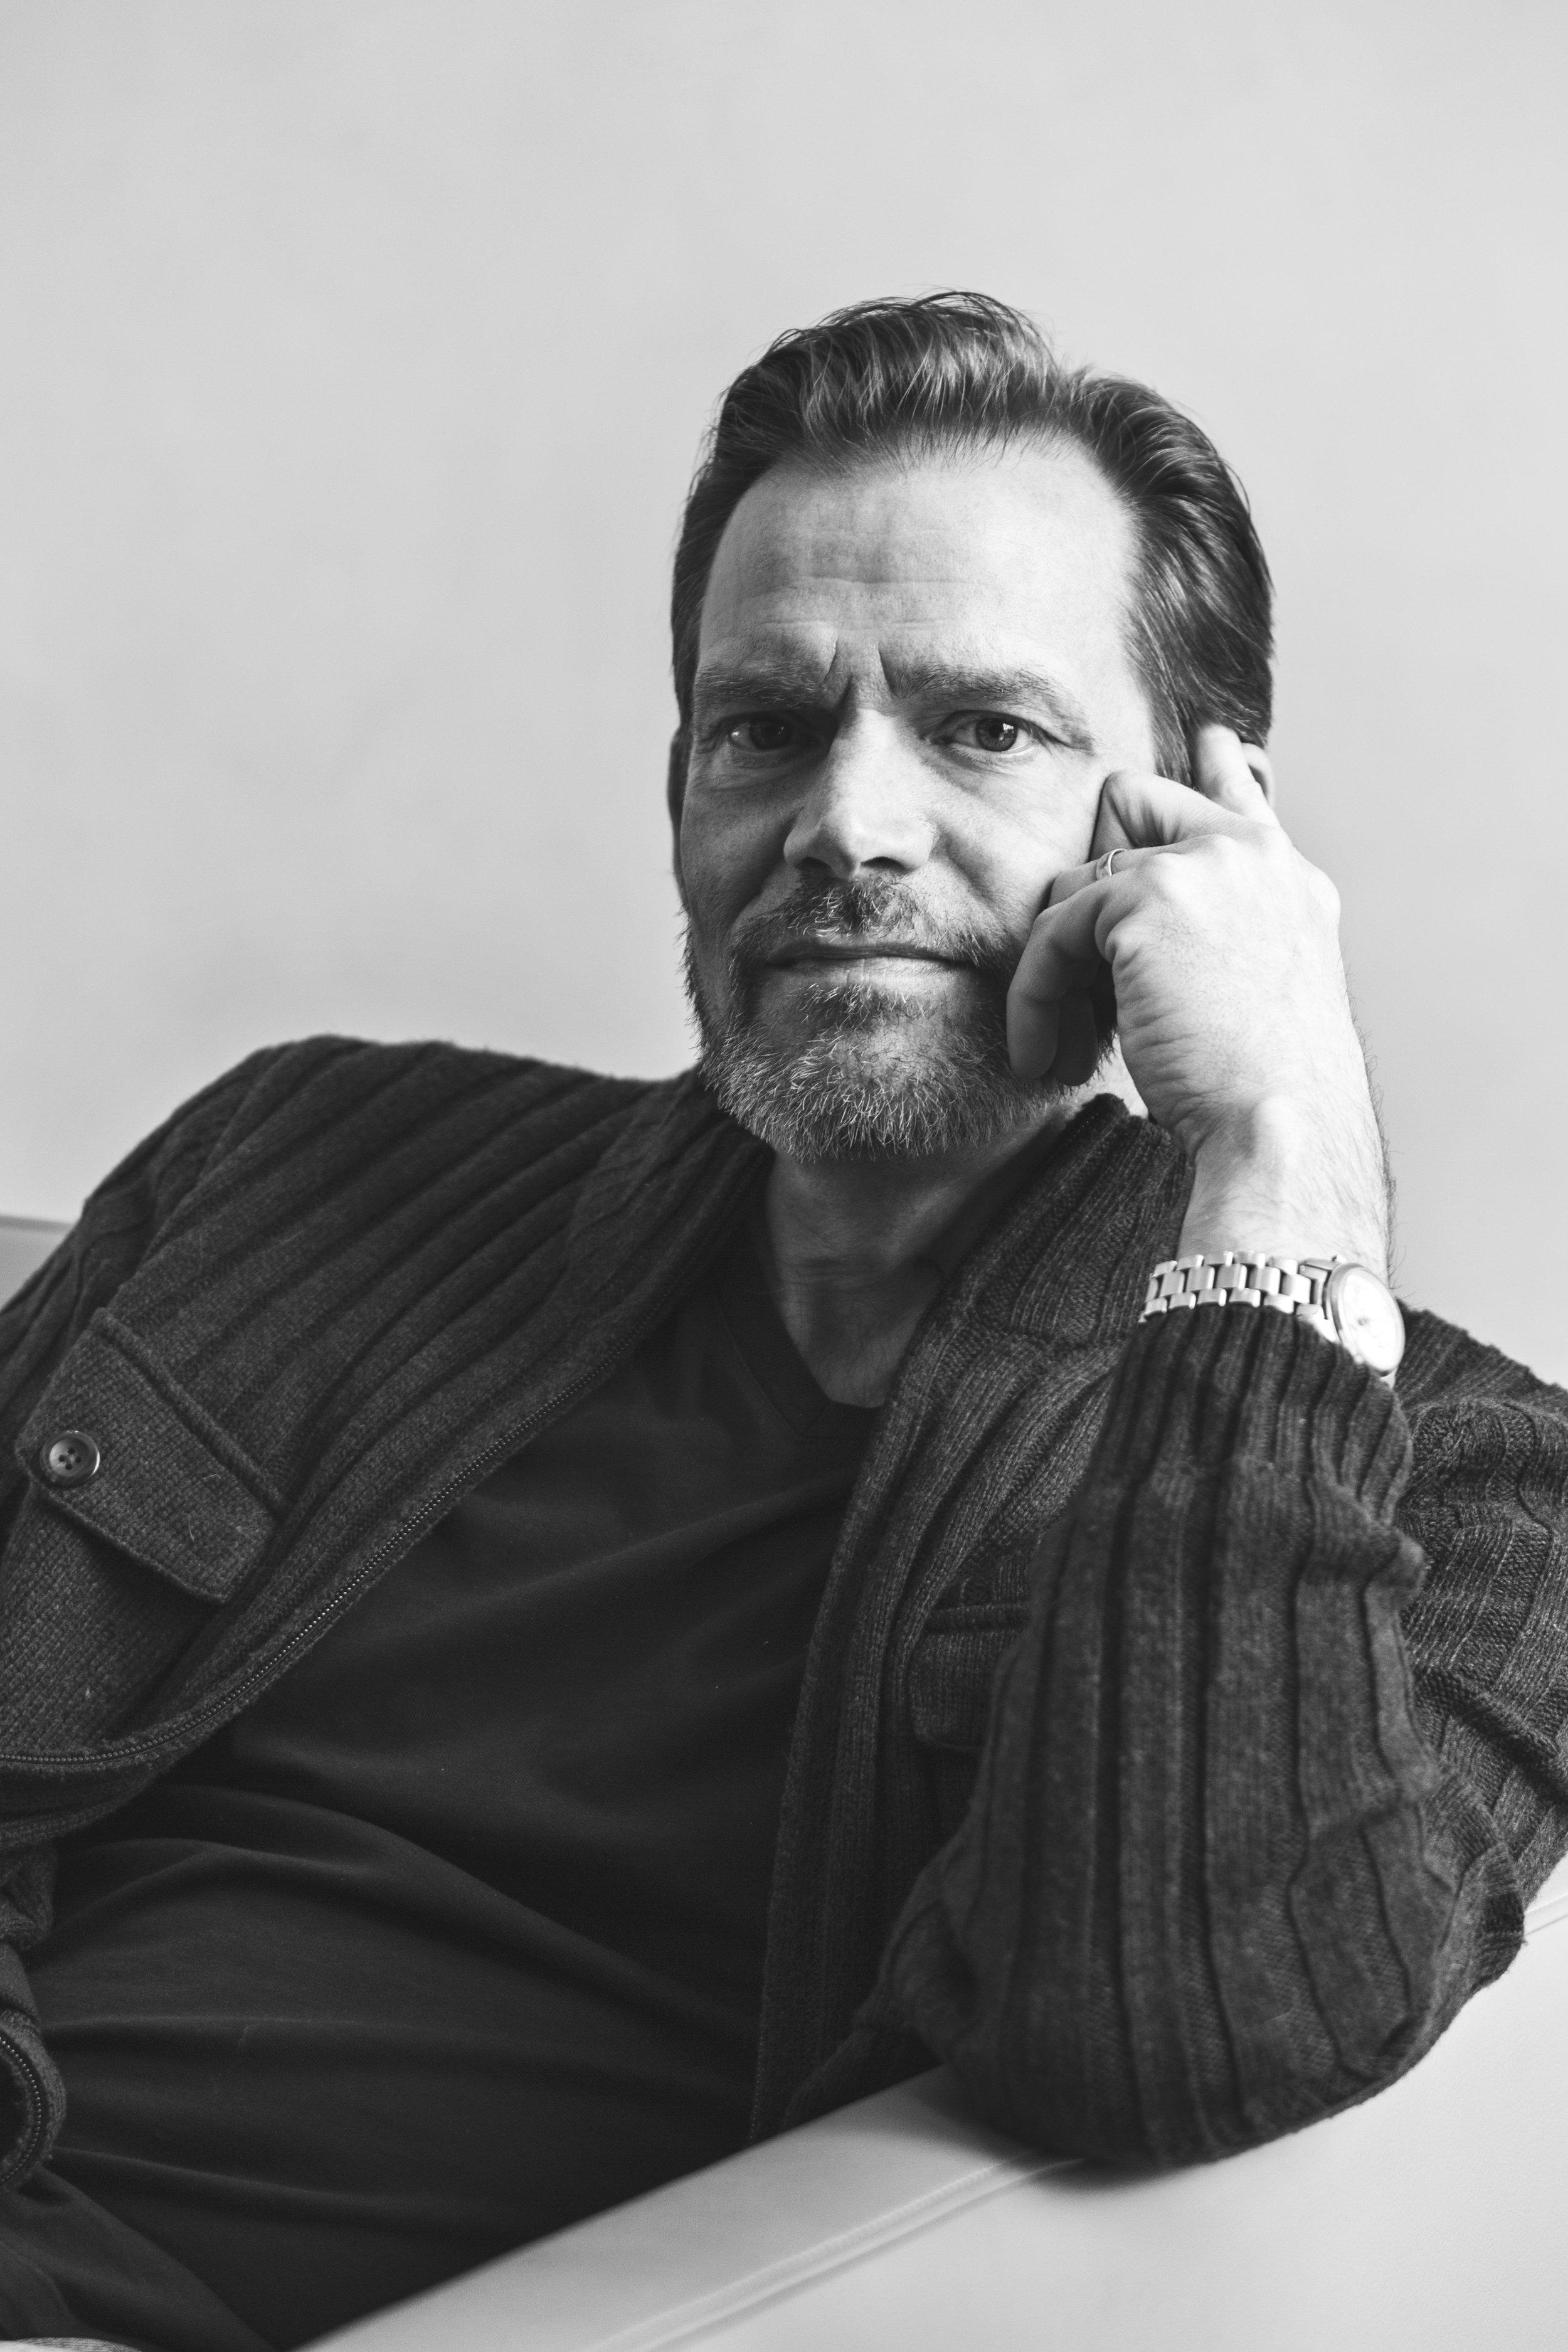 Mark Benninghofen (Sweeney Todd)